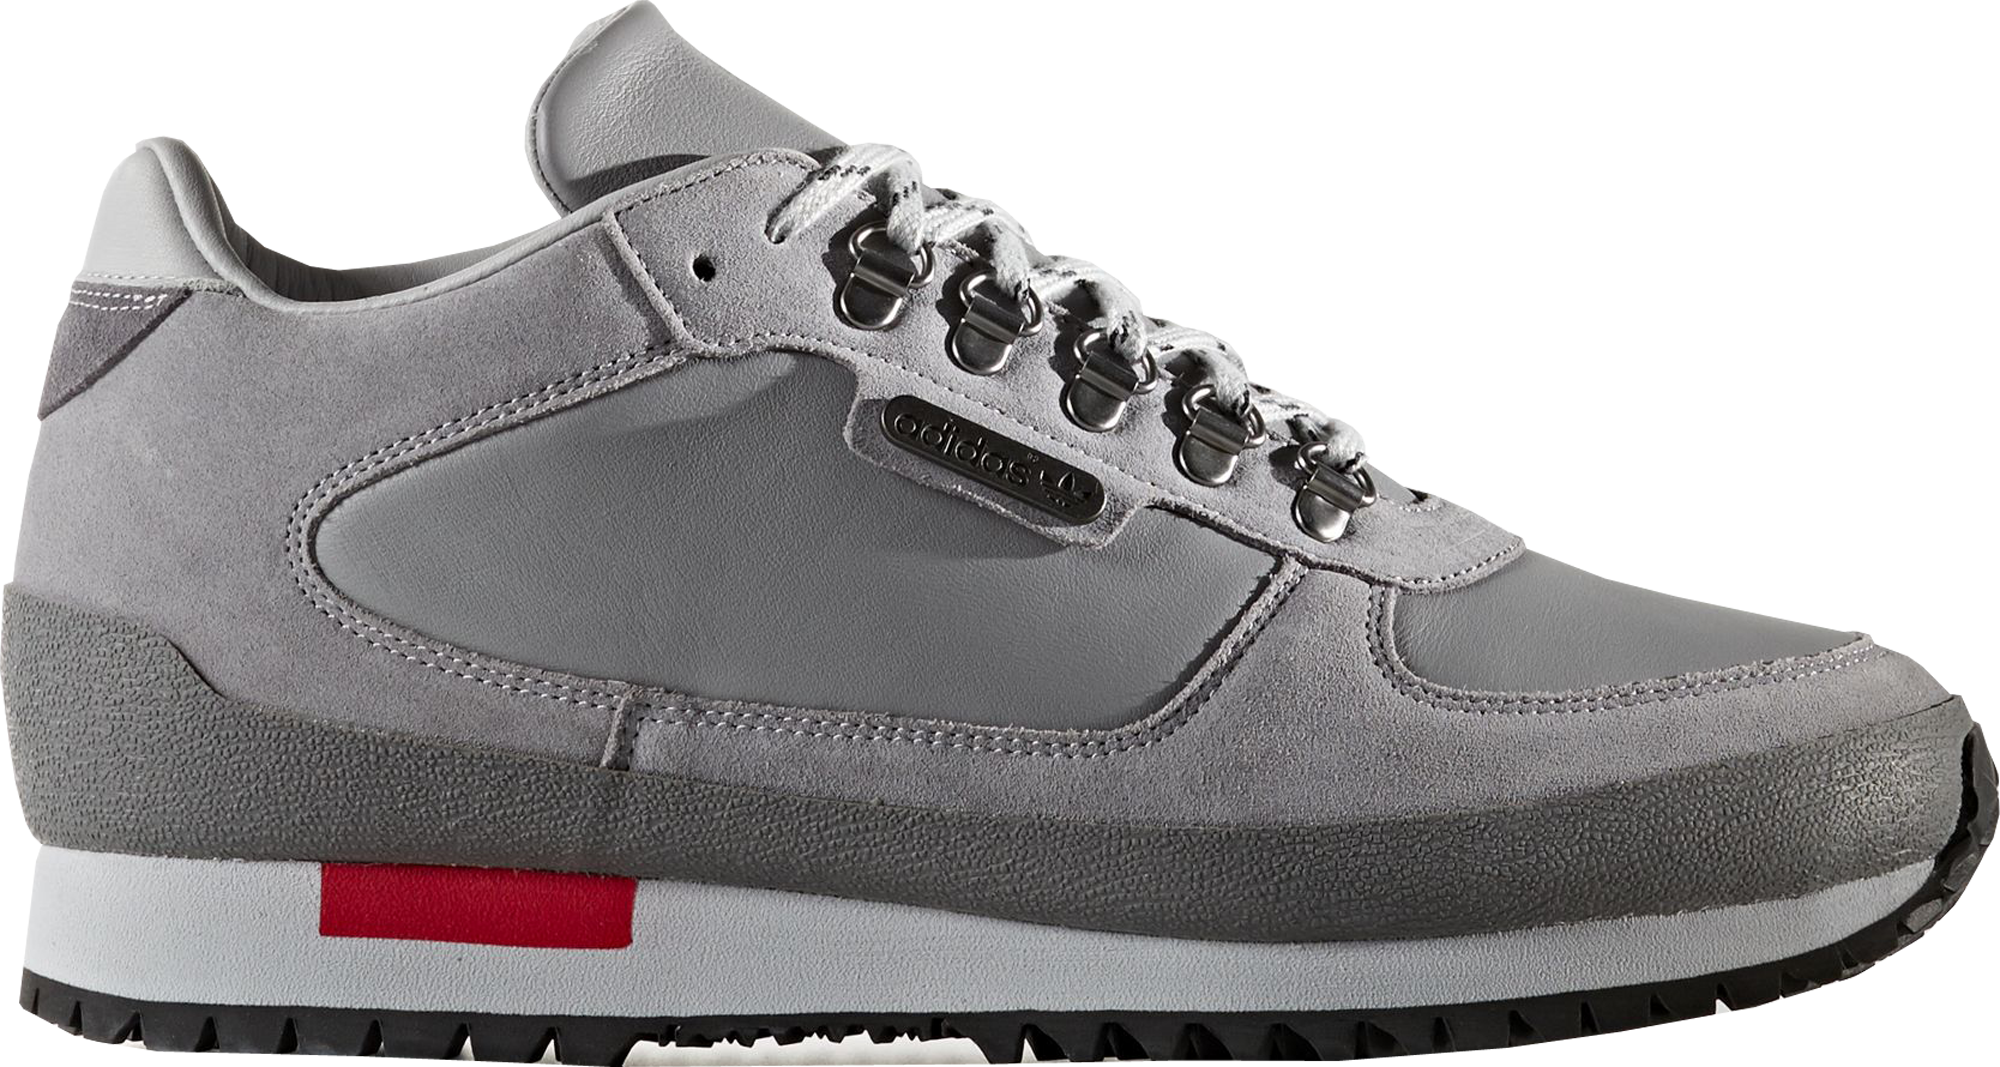 adidas Spezial Winterhill Grey - CG2927